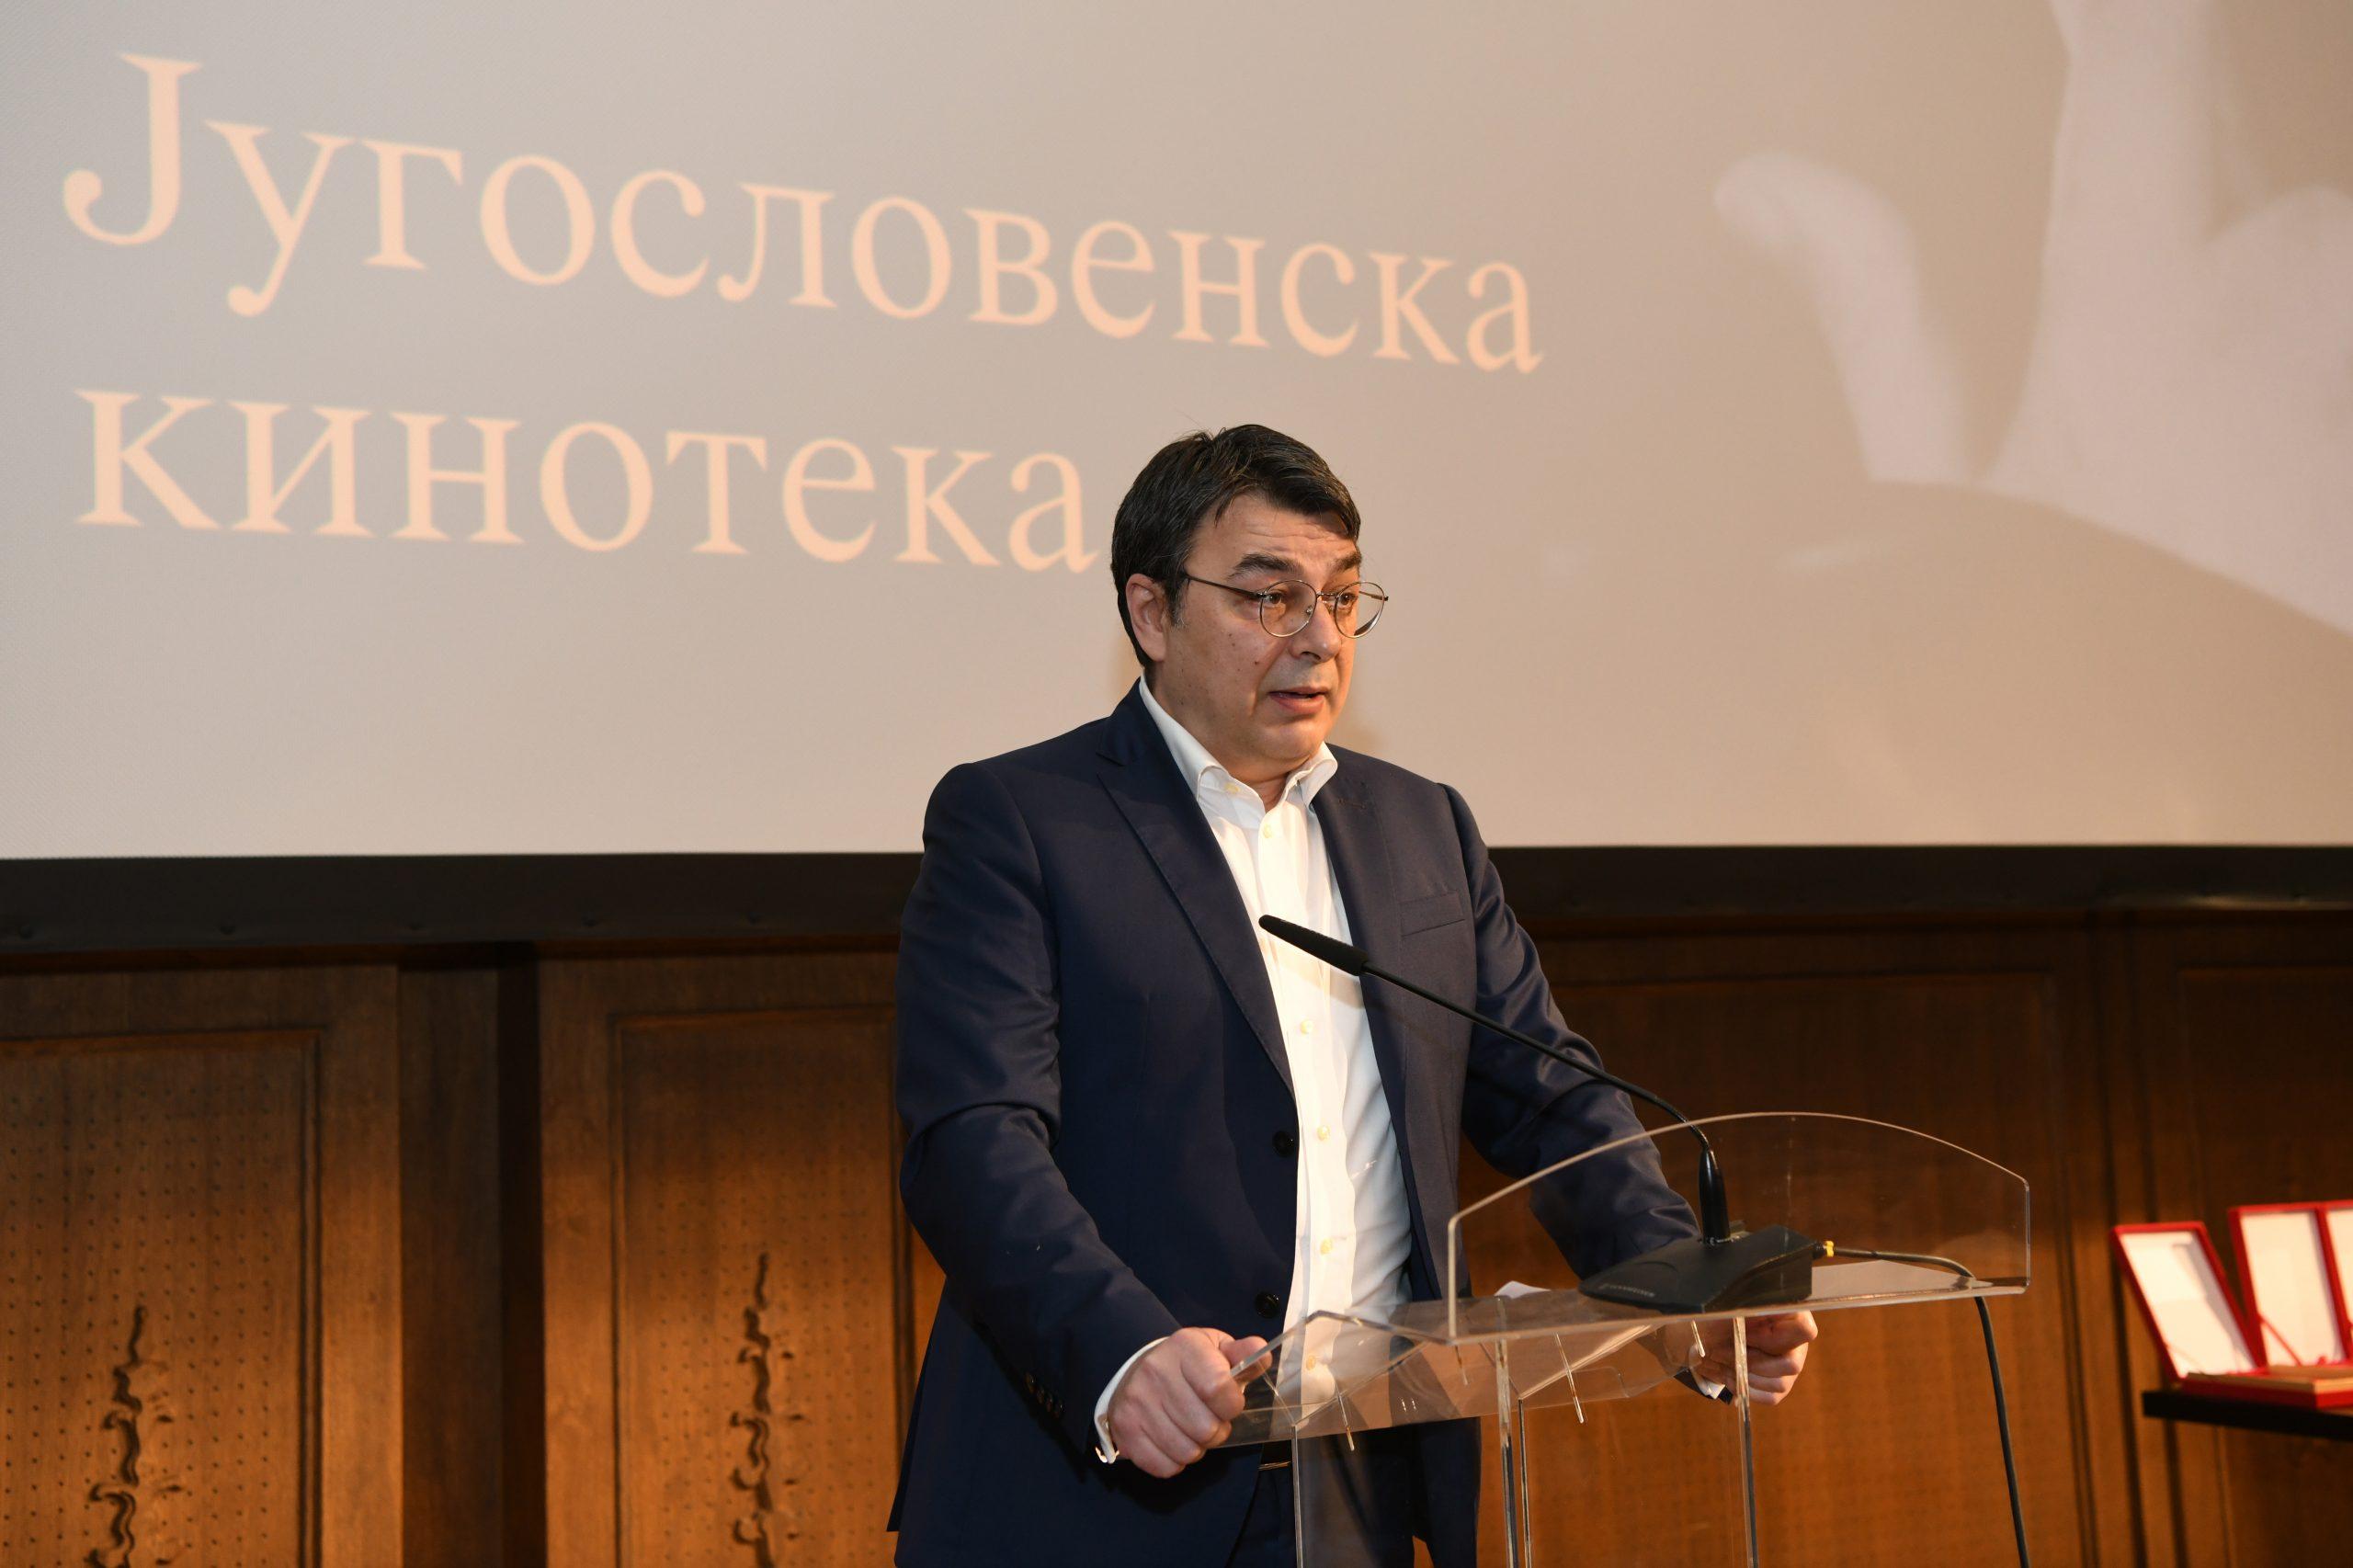 Jugoslovenska kinoteka dodela priznanja Zlatni pecat Jugoslav Pantelic